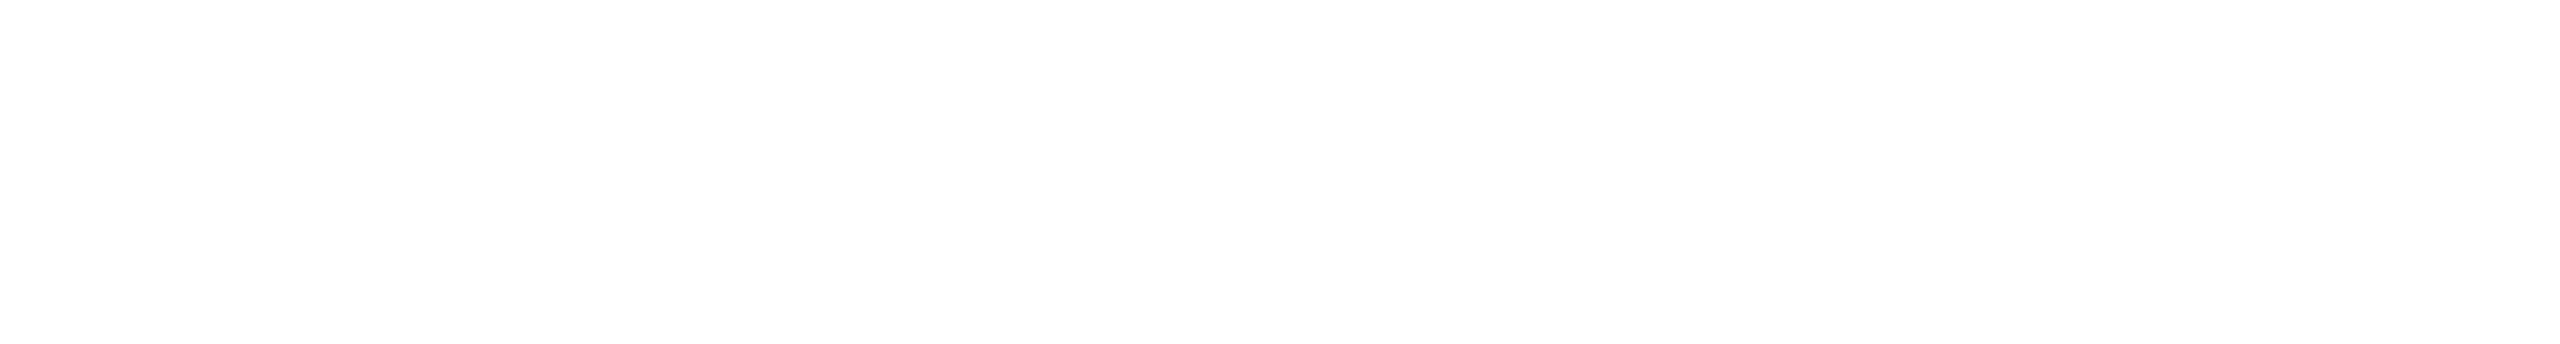 ppt 背景 背景图片 边框 模板 设计 相框 2560_344